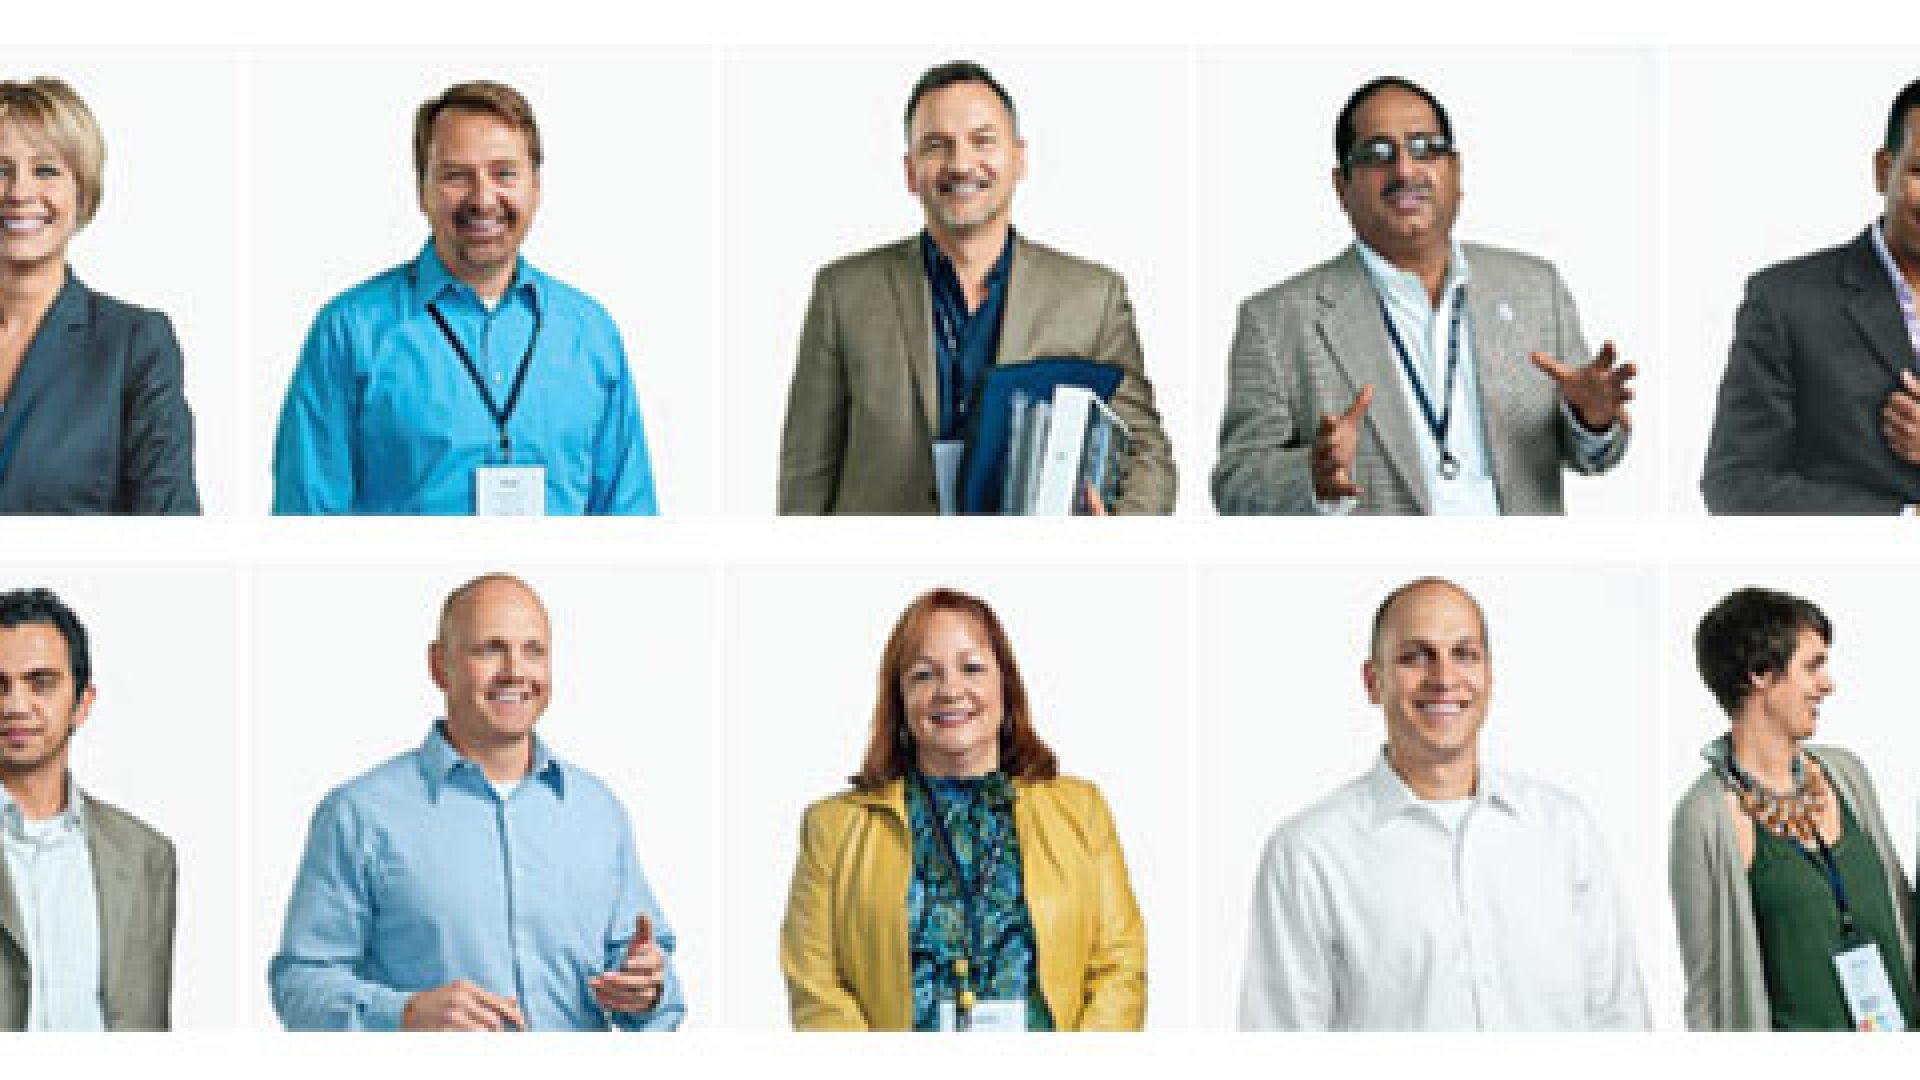 <strong>Straight Talk</strong> From top left: Jacquie Morgan, Mark Swanson, Lee Wochner, Adil Adi, David Doggette, Hassan Bawab, Daniel Schmidtendorff, Jennifer Scully, Sonny Clark, Brooks Bell, Jesse Lipson